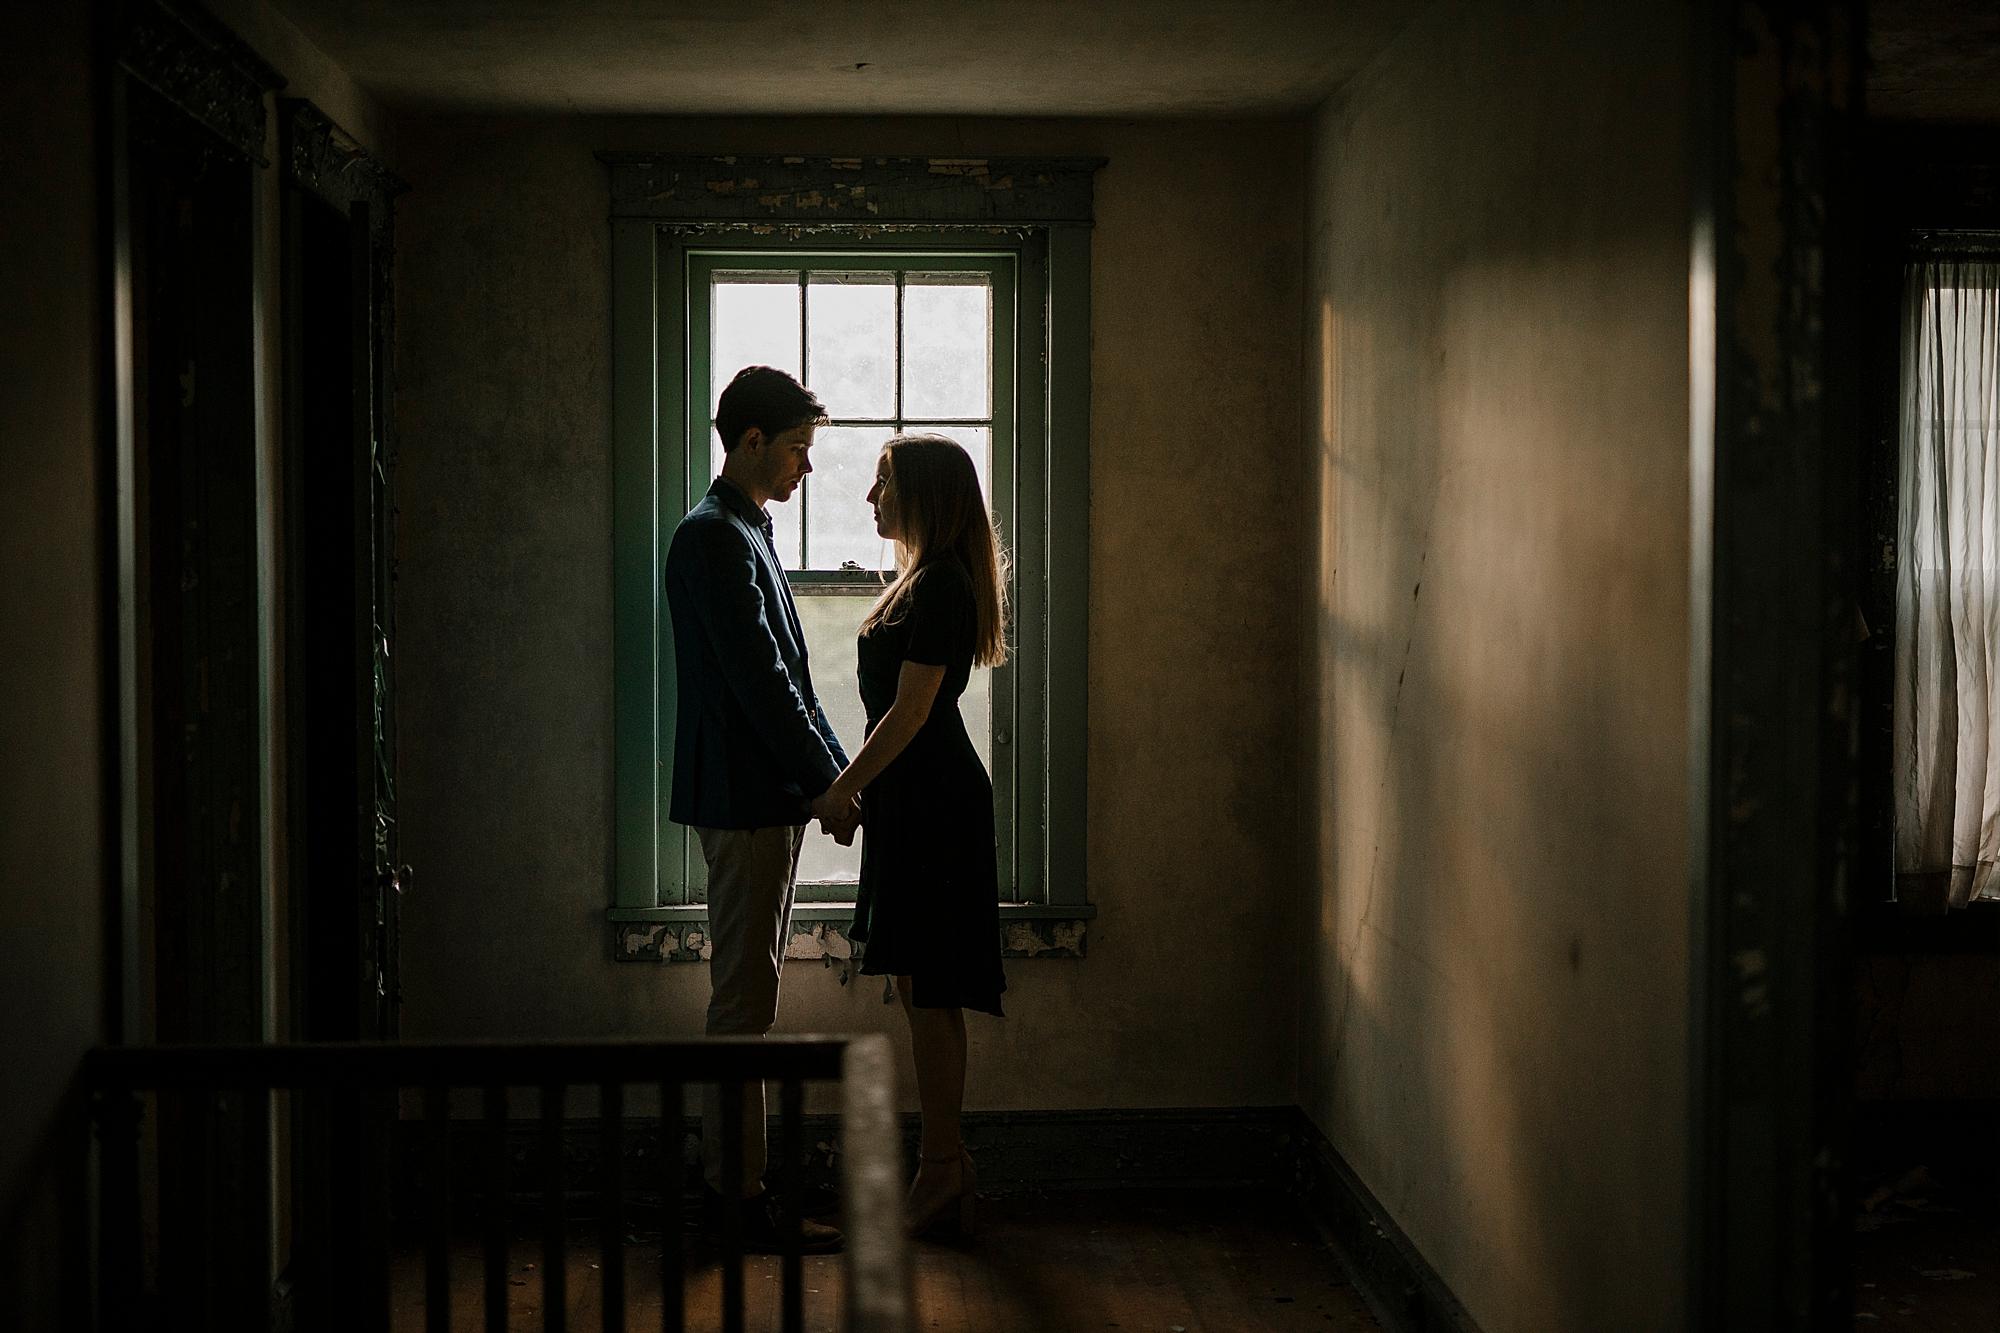 Tori_Zack_Glen_Mills_Terrain Cafe_Wedding_Engagement_Photography_Joe_Mac_Creative__0050.jpg